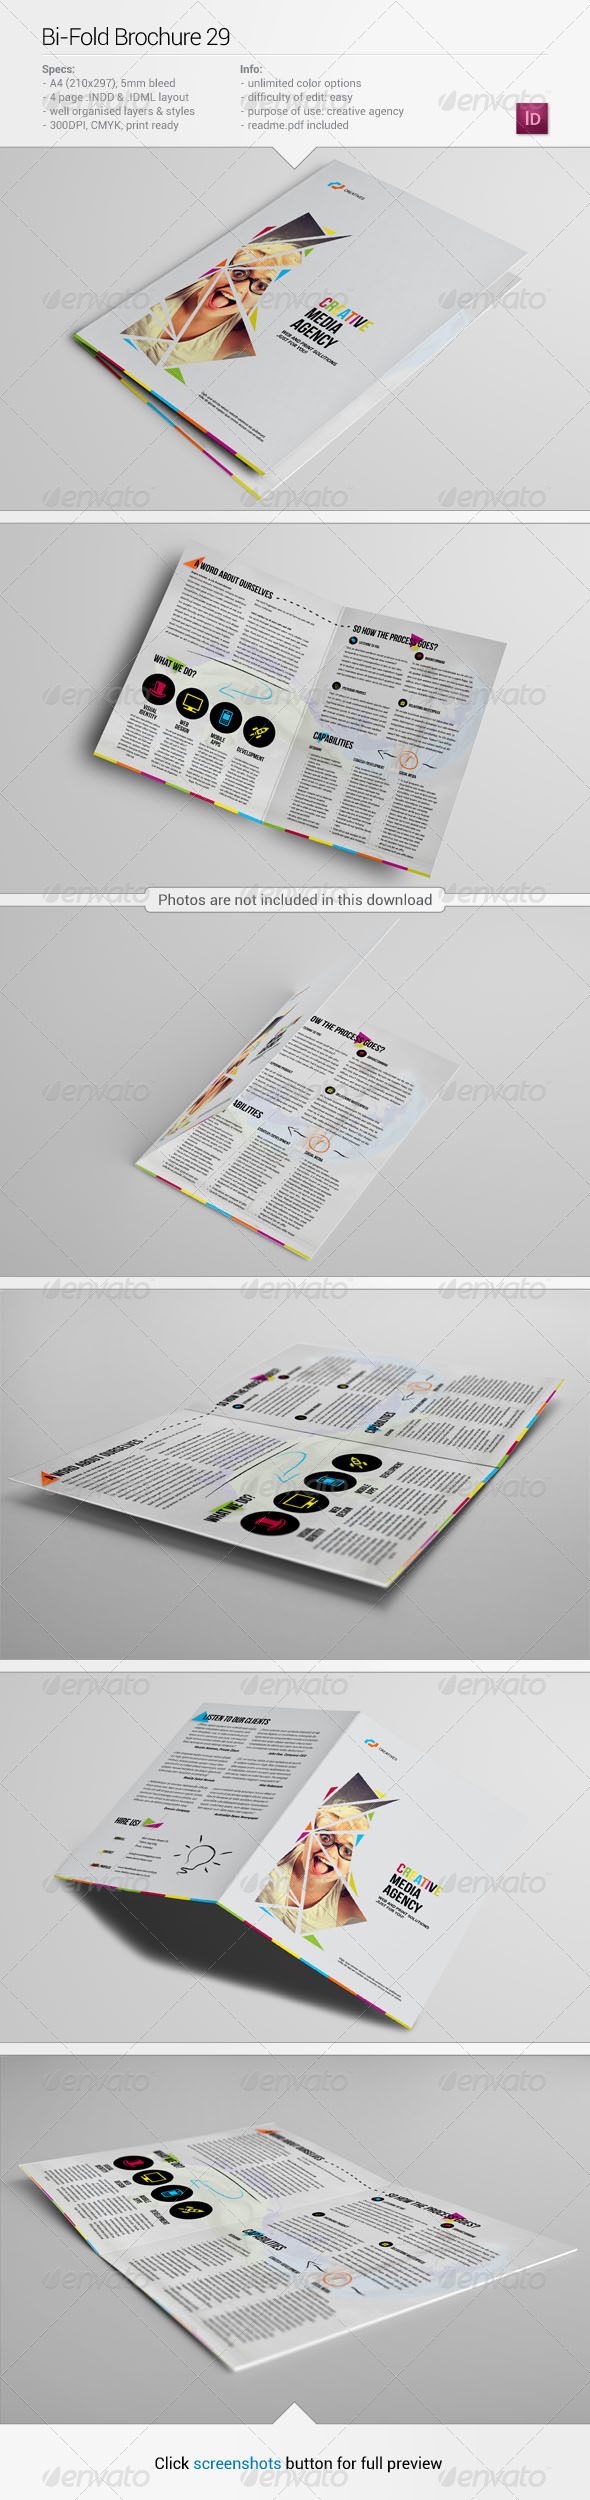 Bi-Fold Brochure 29 - Informational Brochures